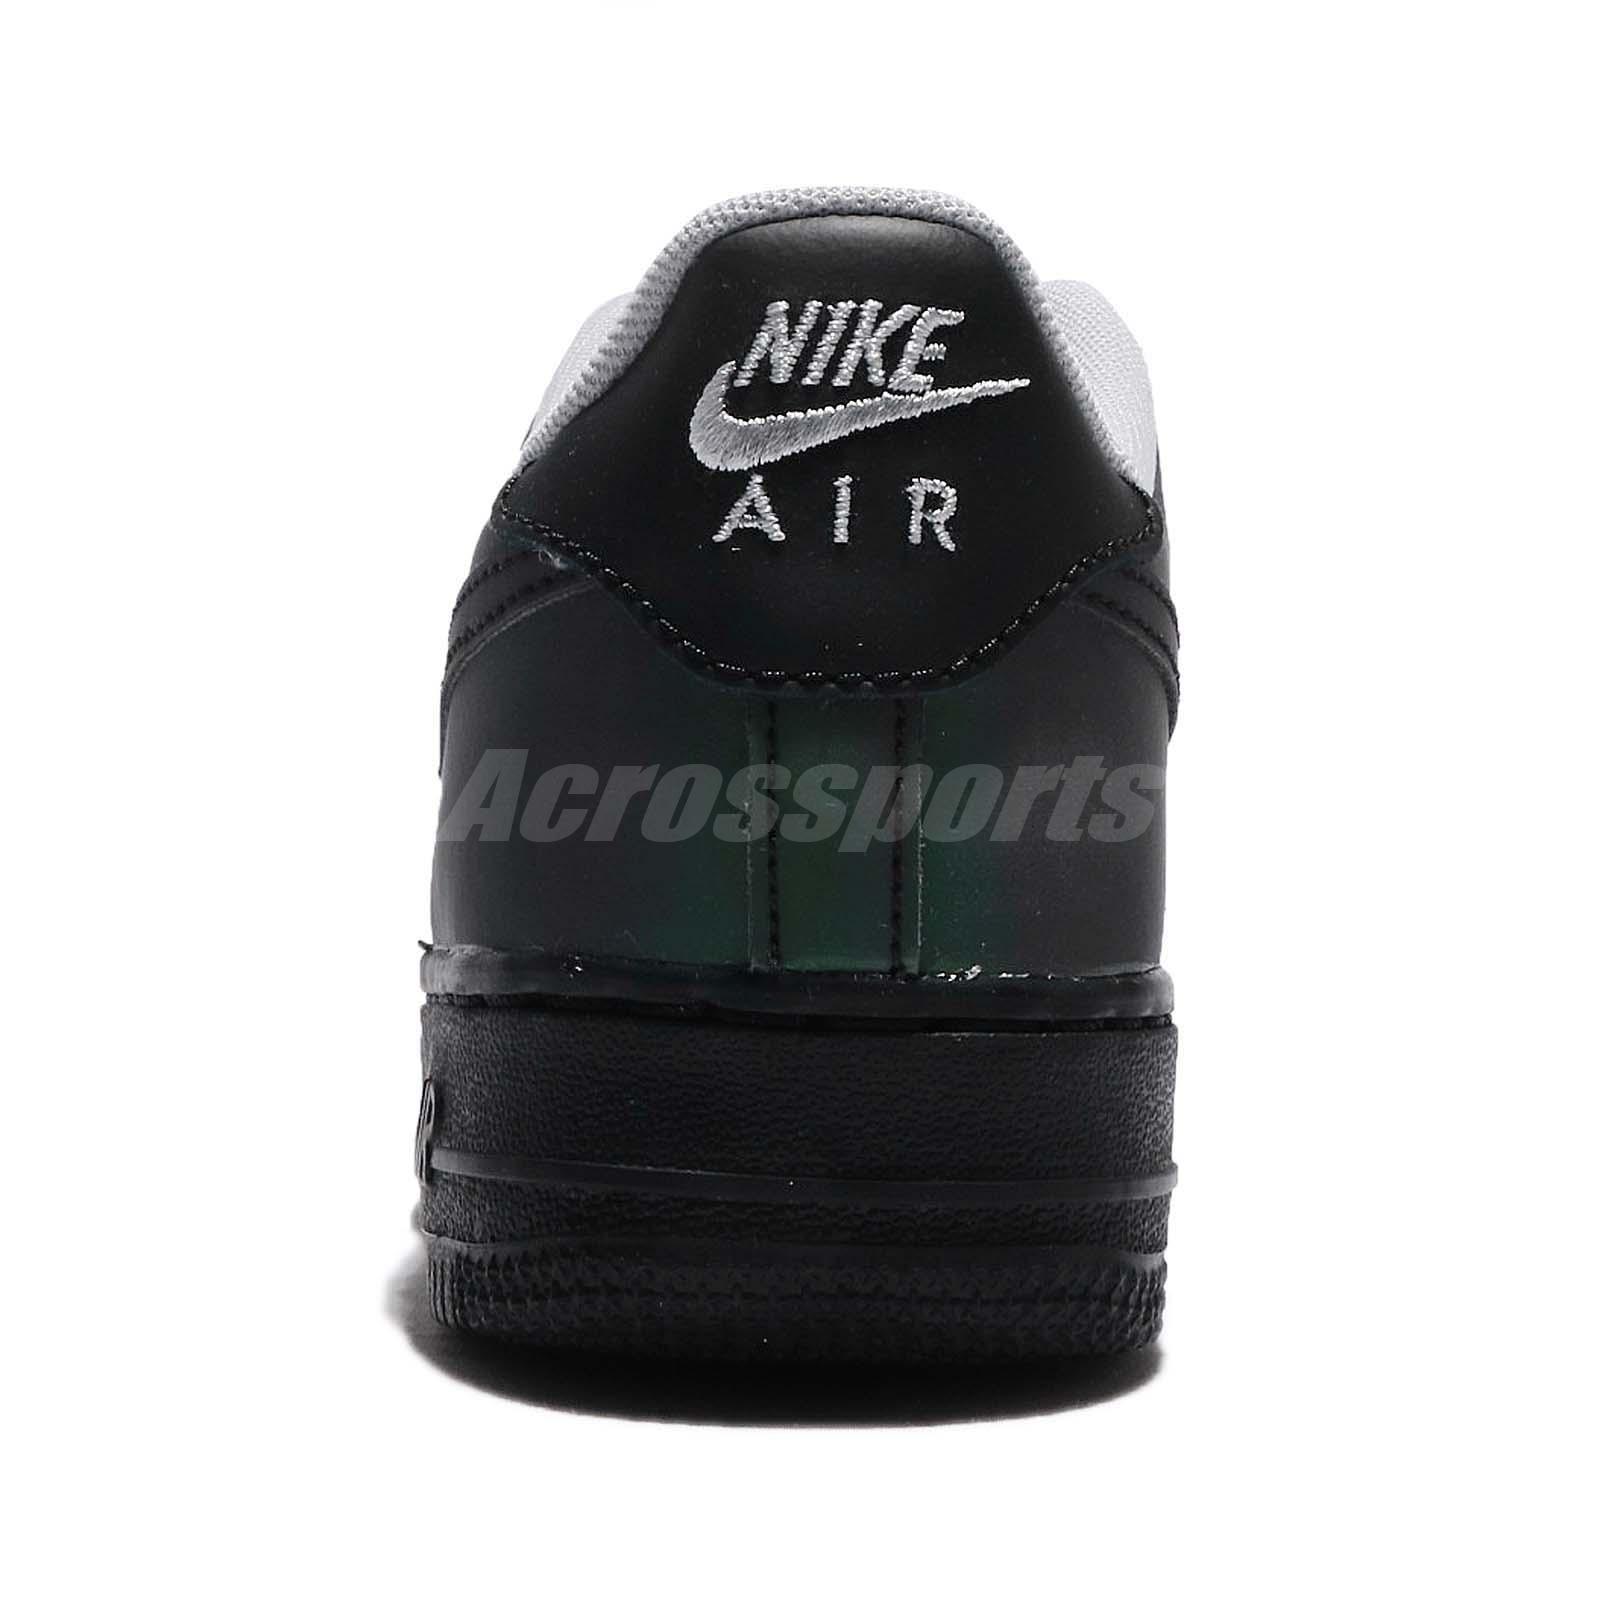 7332d21912cd Nike Air Force 1 LV8 GS Reflective Black AF1 Kids Women Shoes ...